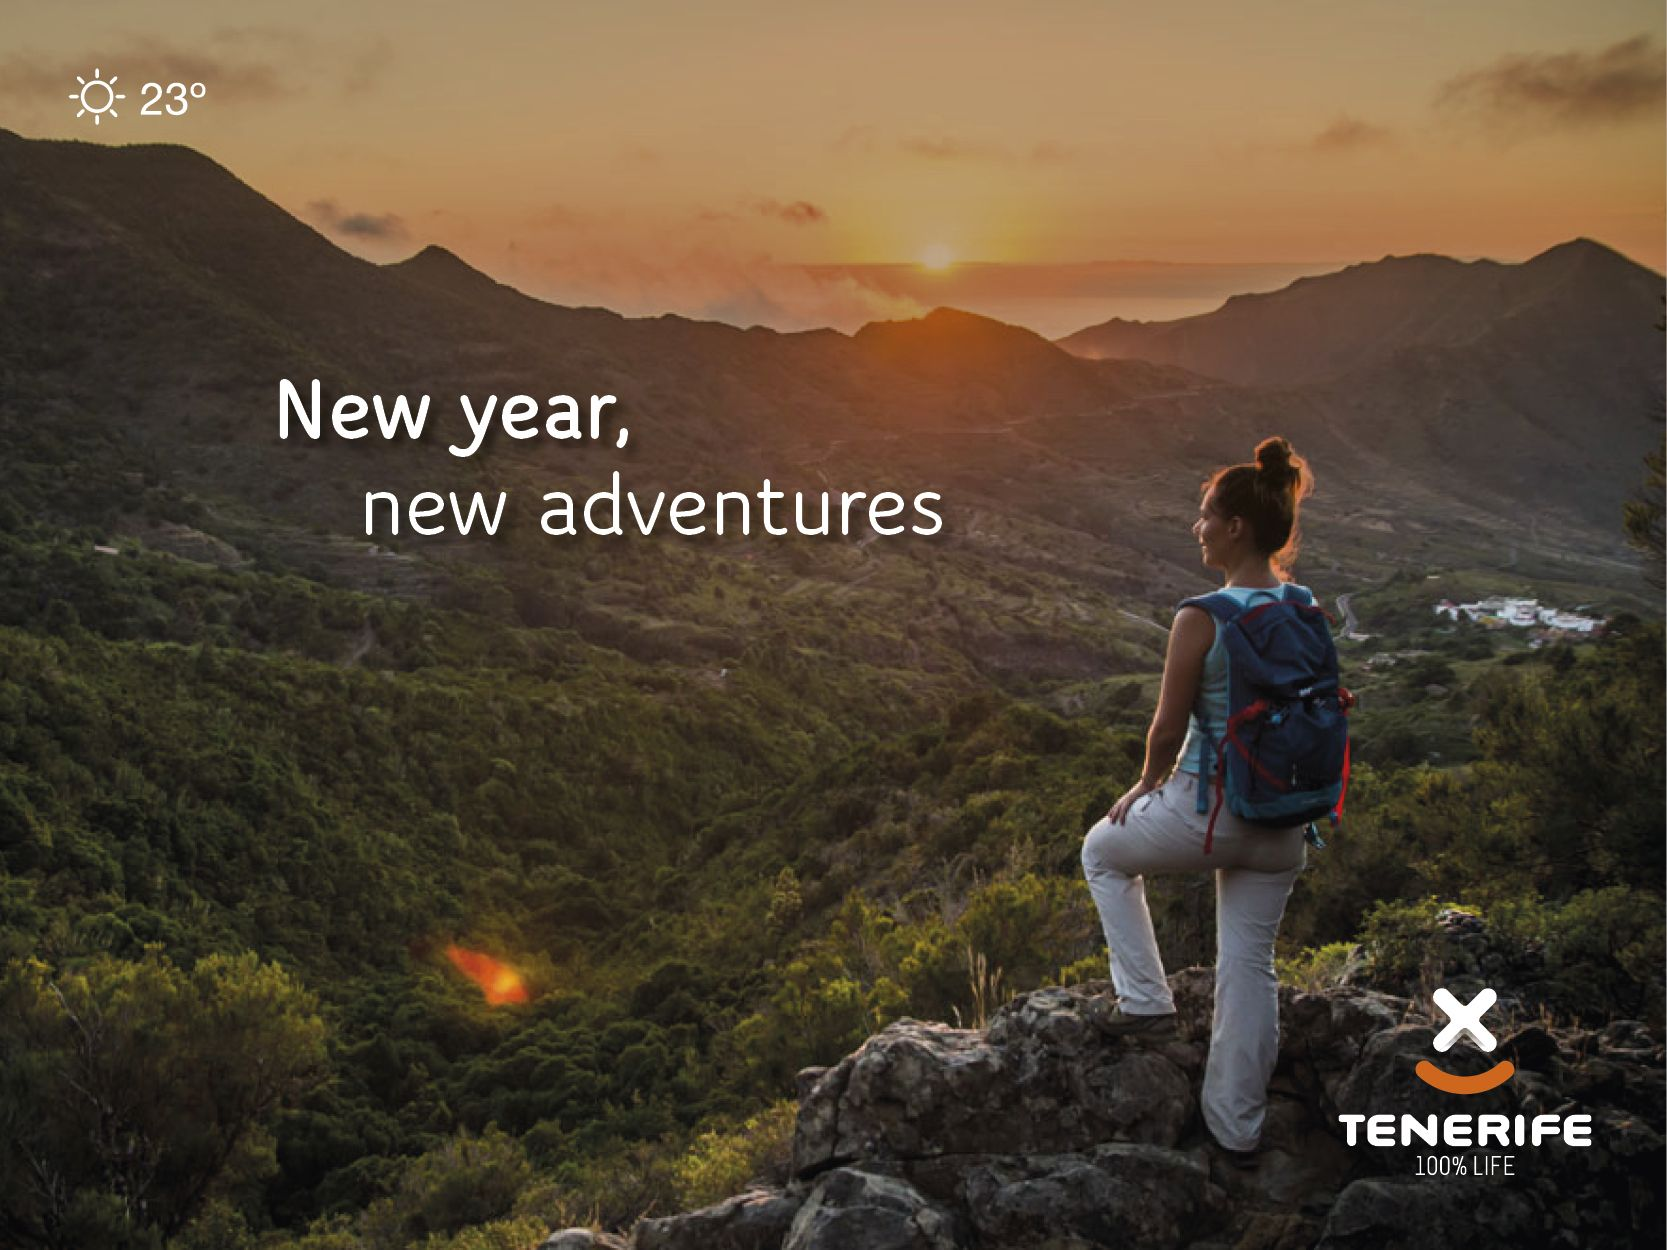 Feliz Año! Año nuevo, viajes nuevos. Tenerife, Islas Canarias // Happy New Year! New year, new adventures. Tenerife, Canary Islands // Ein frohes Neues Jahr! Neues Jahr, neue Abenteuer. Teneriffa, Kanarische Inseln. #VisitTenerife